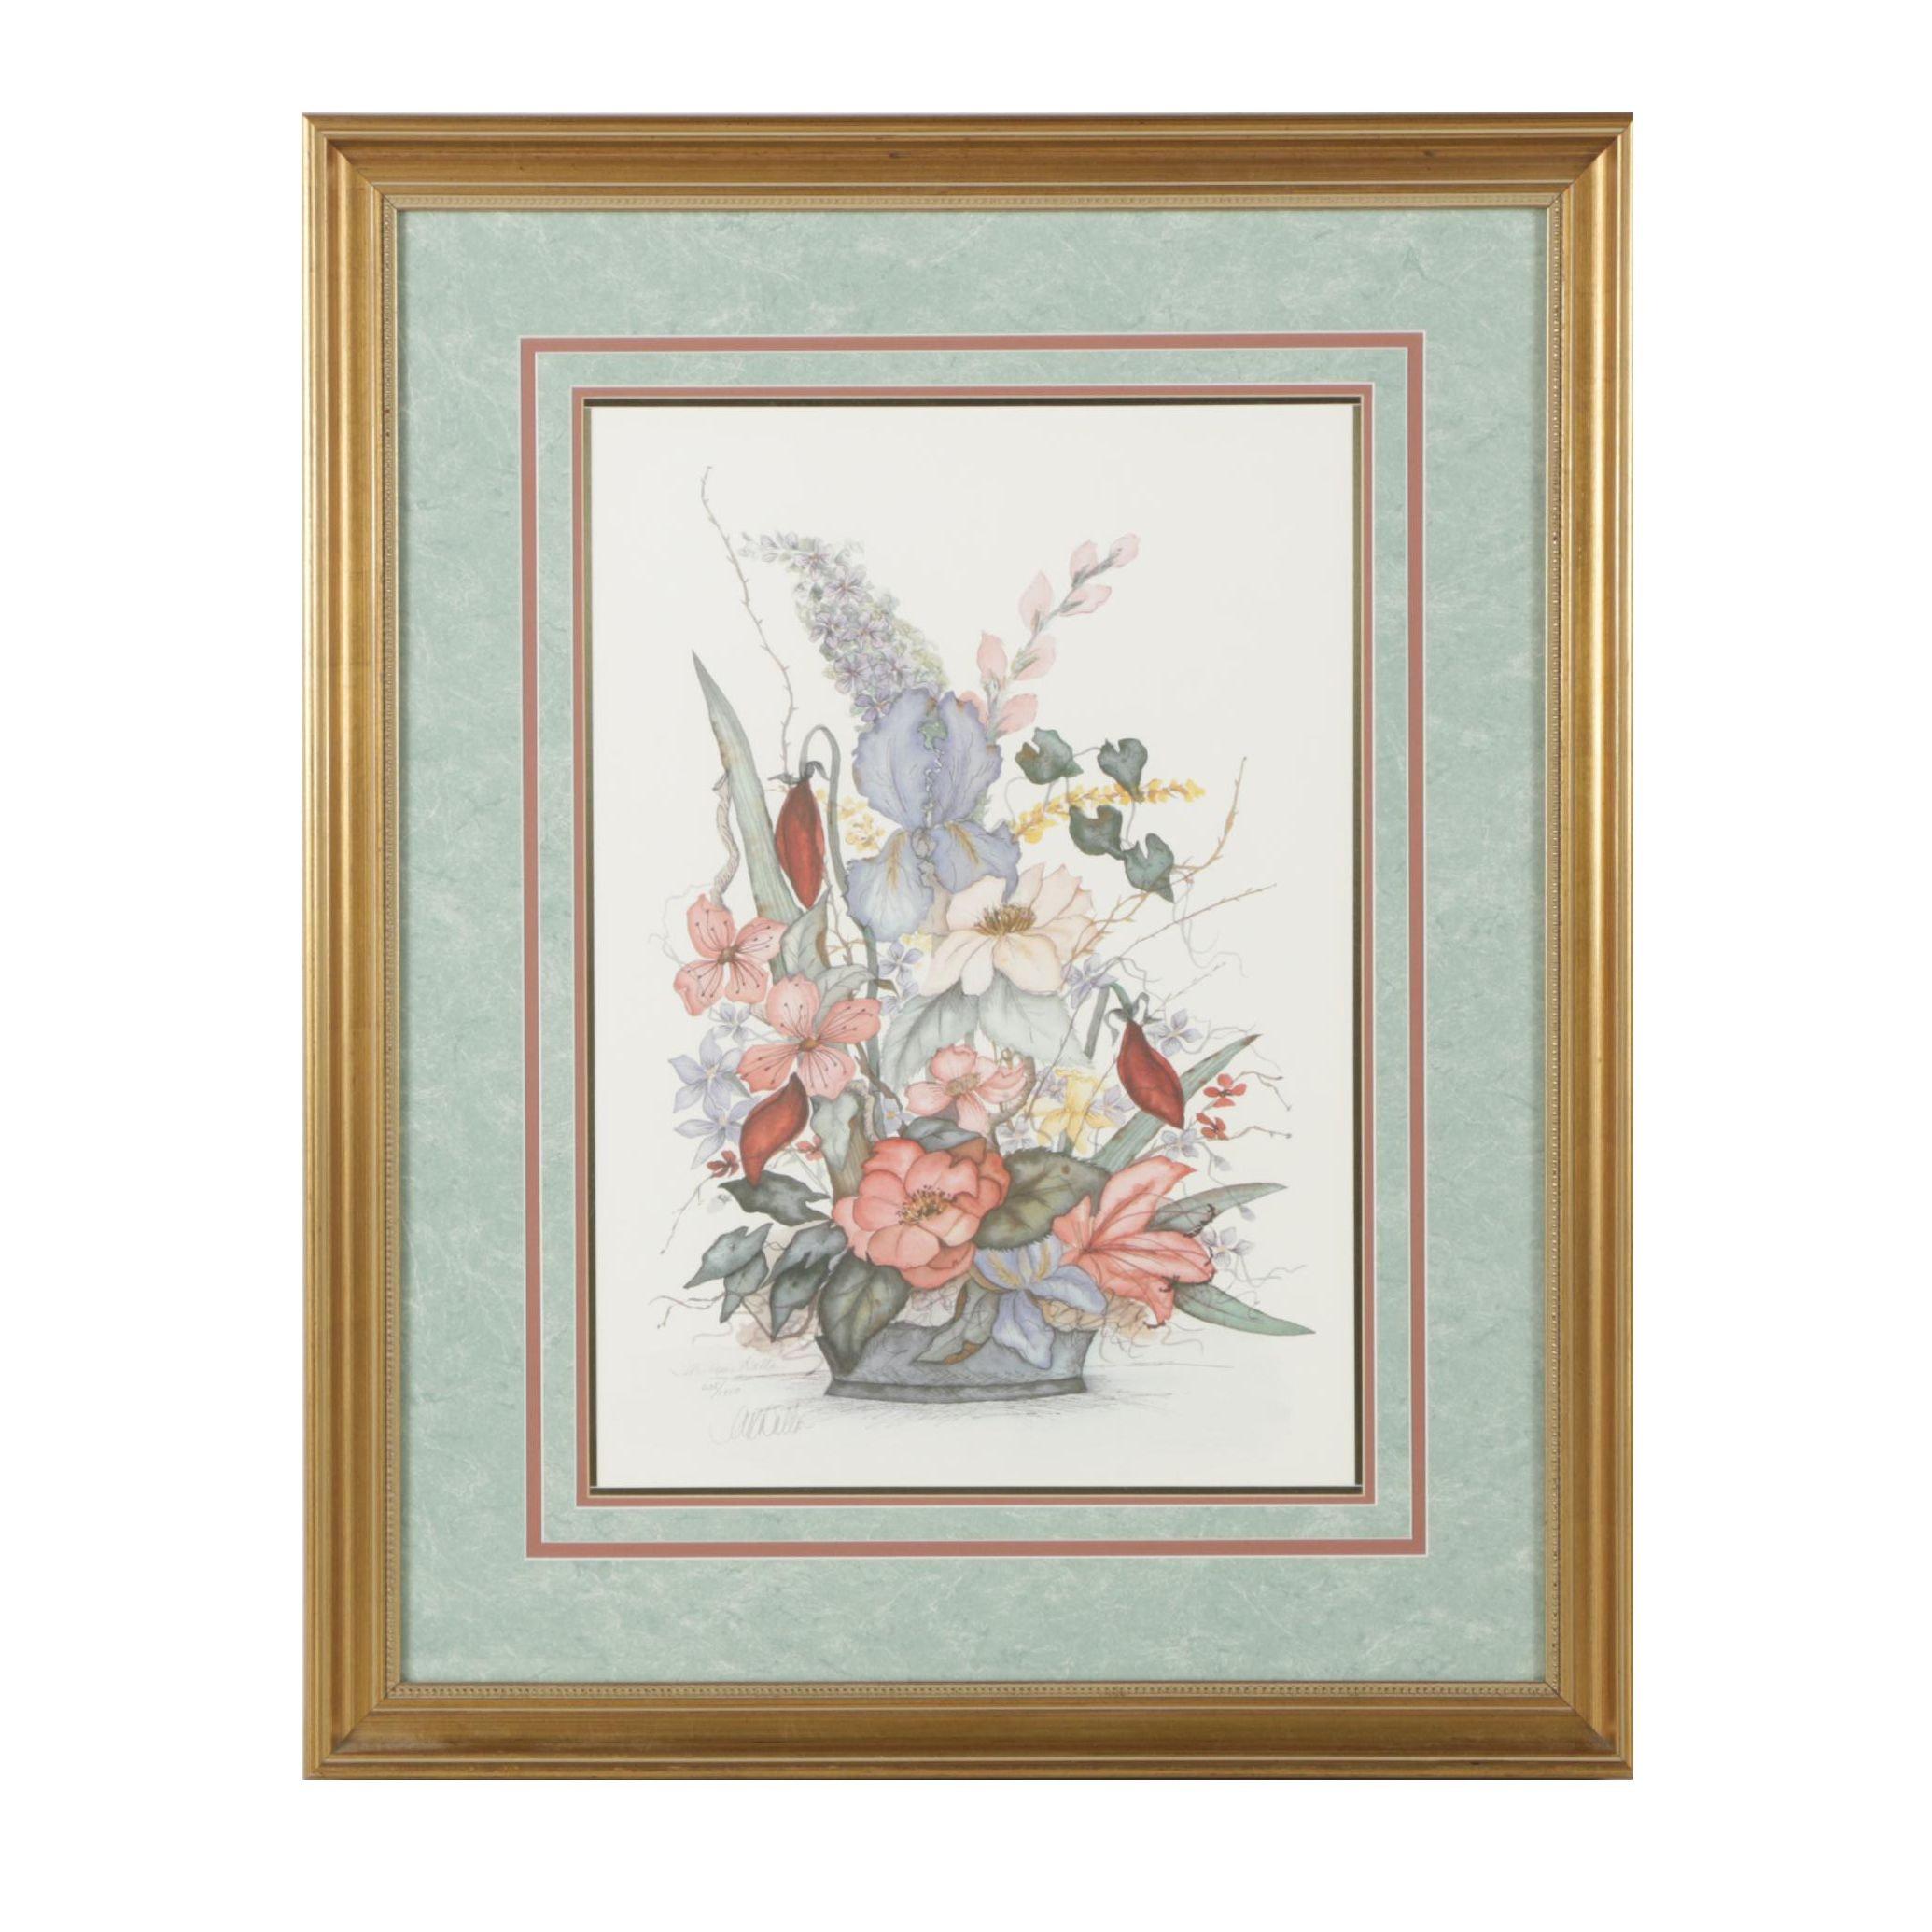 A. Renée Dollar Limited Edition Offset Lithograph of Floral Arrangement